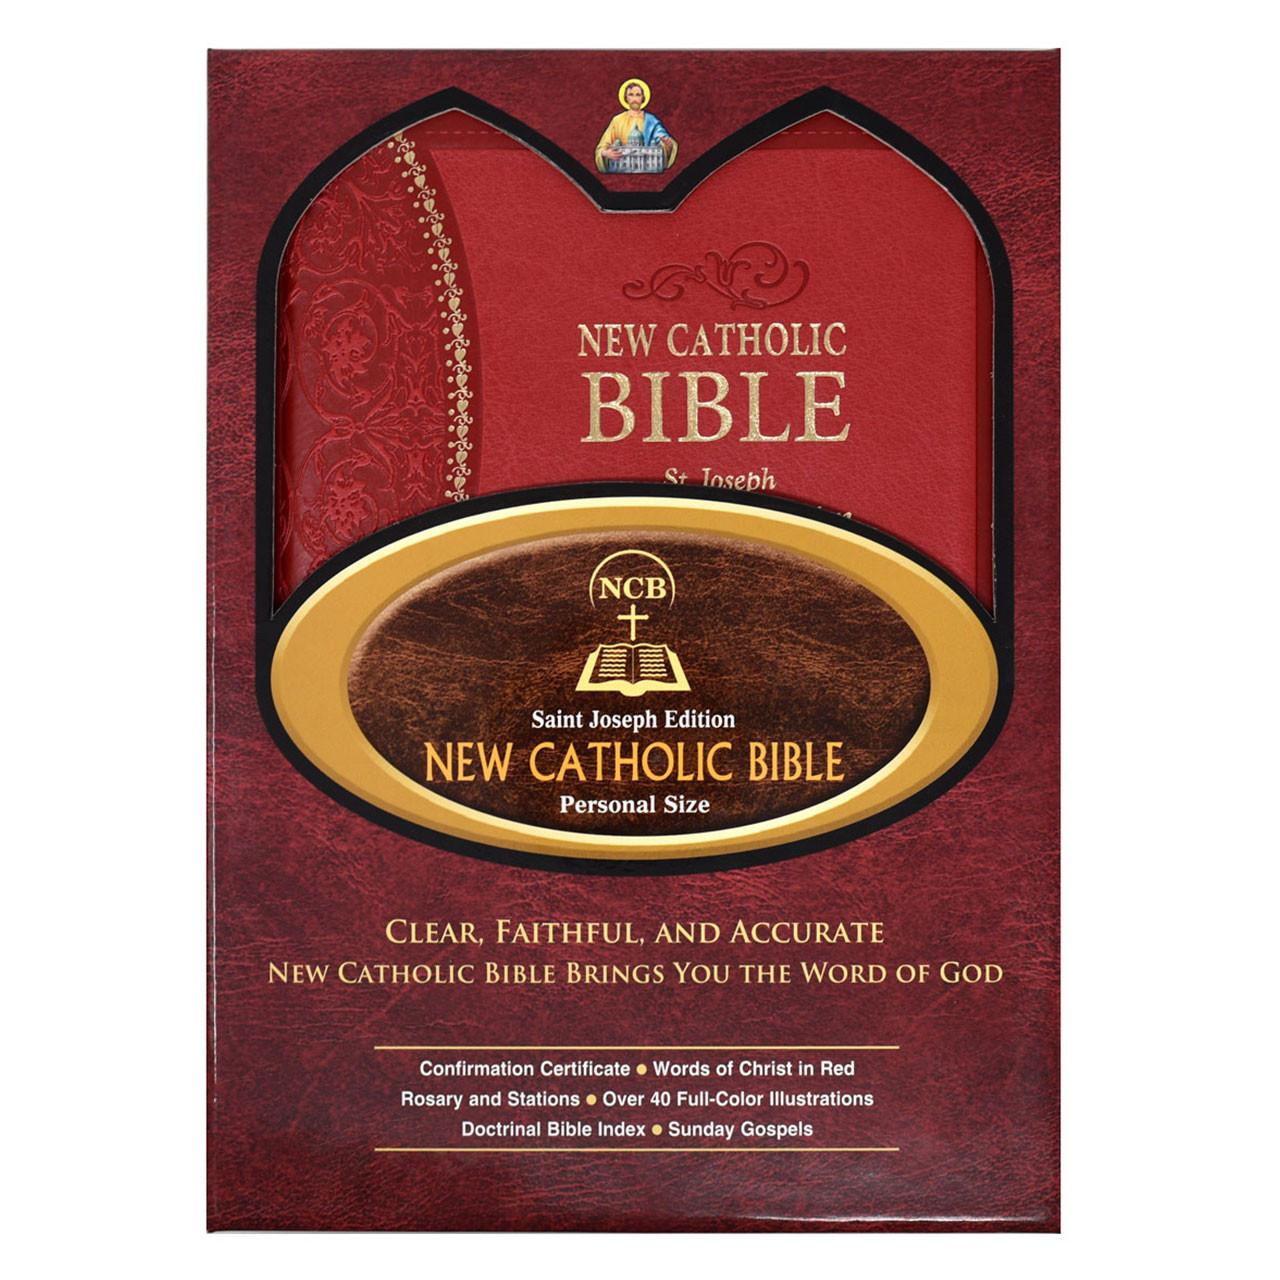 Gift Box of the St. Joseph Confirmation New Catholic Bible